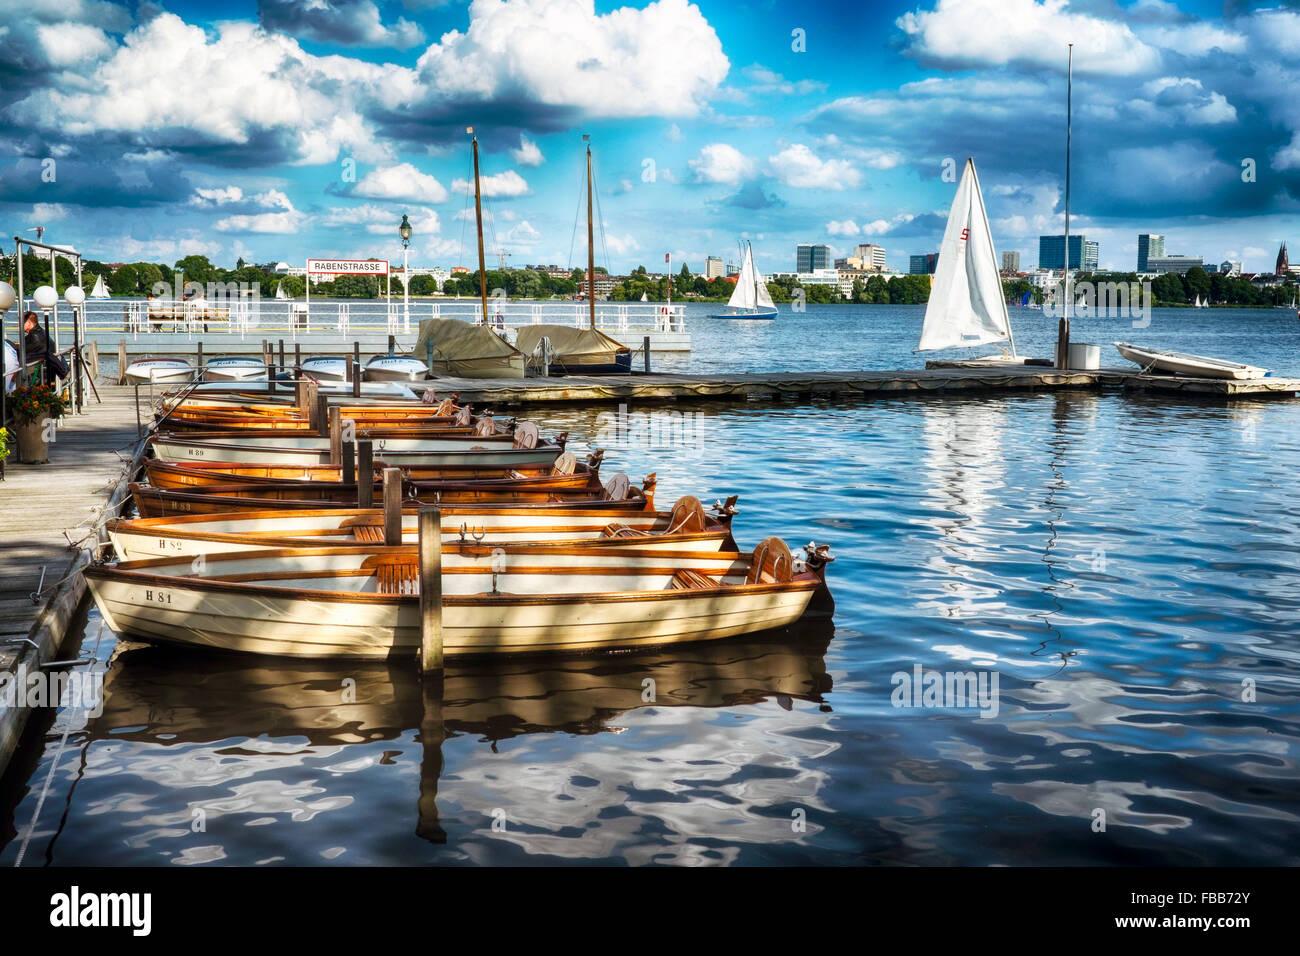 Small Boats at a Pier, Alster Lake, Rabenstrasse, Hamburg, Germany - Stock Image